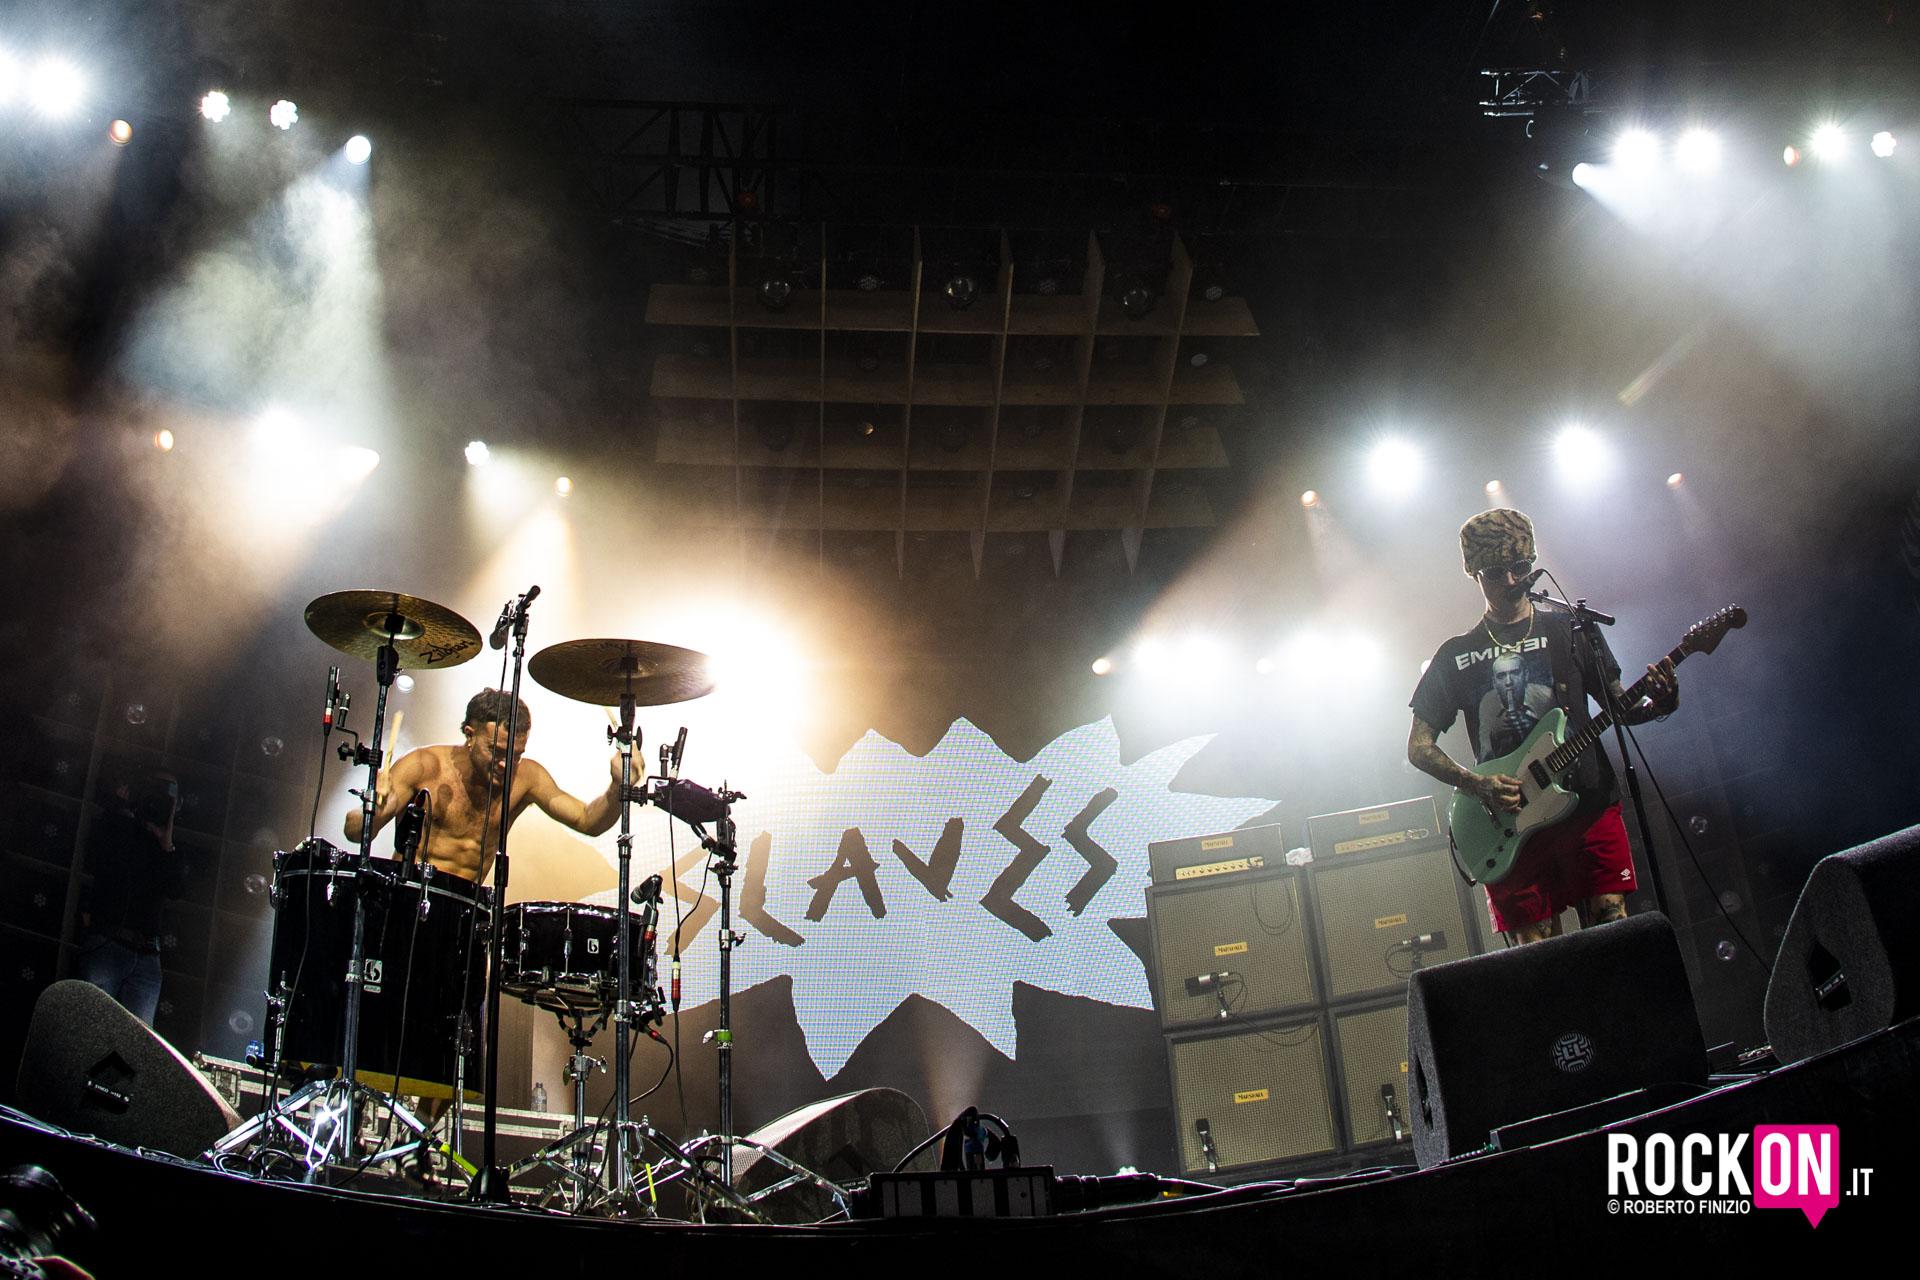 rockon-slaves-lowlands-festival-netherlands-music-concert-roberto-finizio-16-august-2019-50